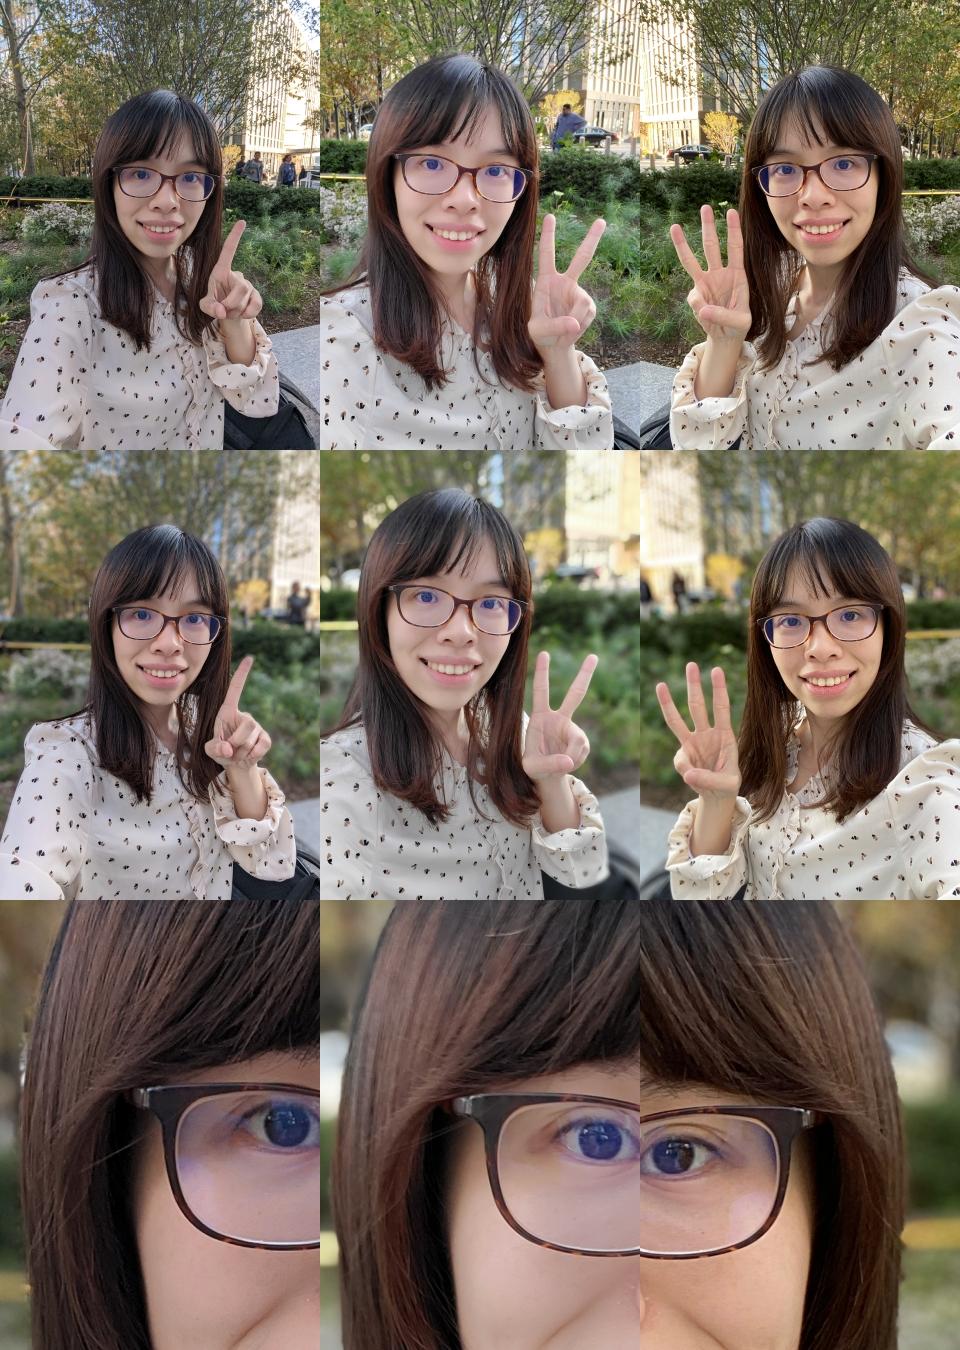 Pixel 4 XL / Note 10+ / iPhone 11 Pro 六種拍照情境對比:日拍、長焦、人像、耀光、夜拍、夜視